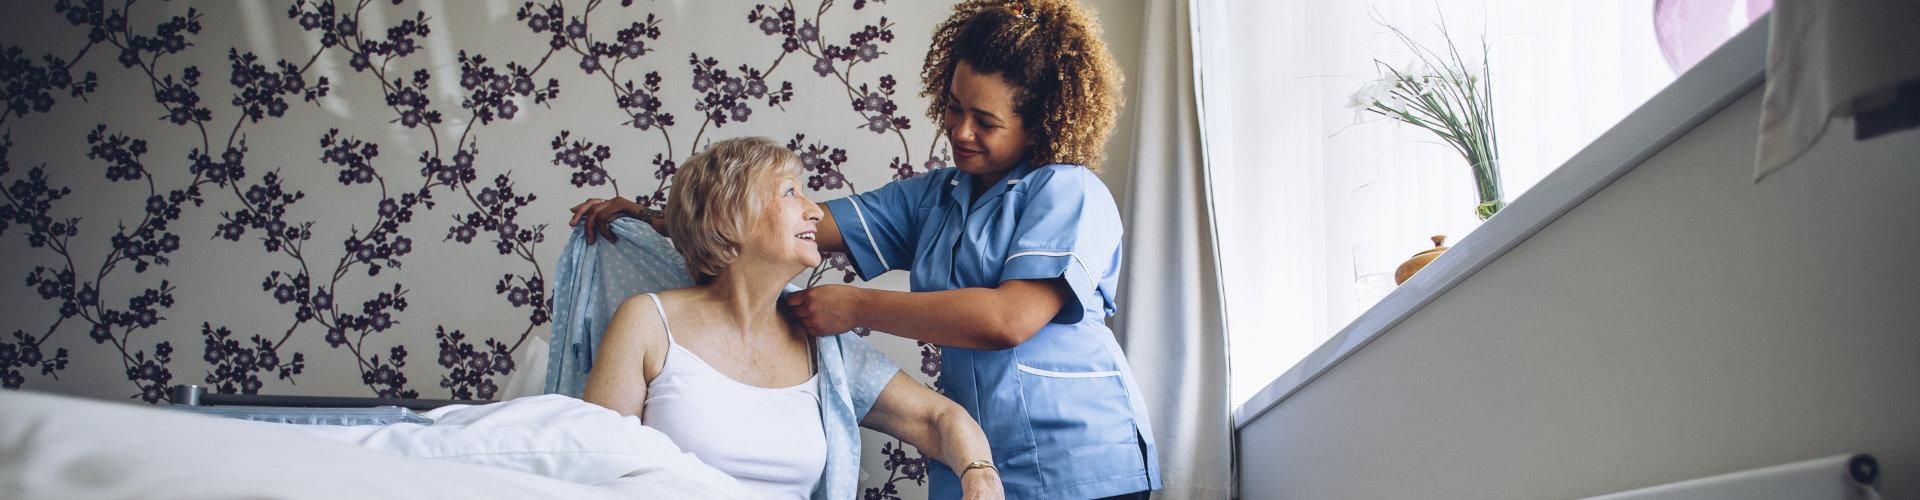 Nurse helping a senior woman get dressed